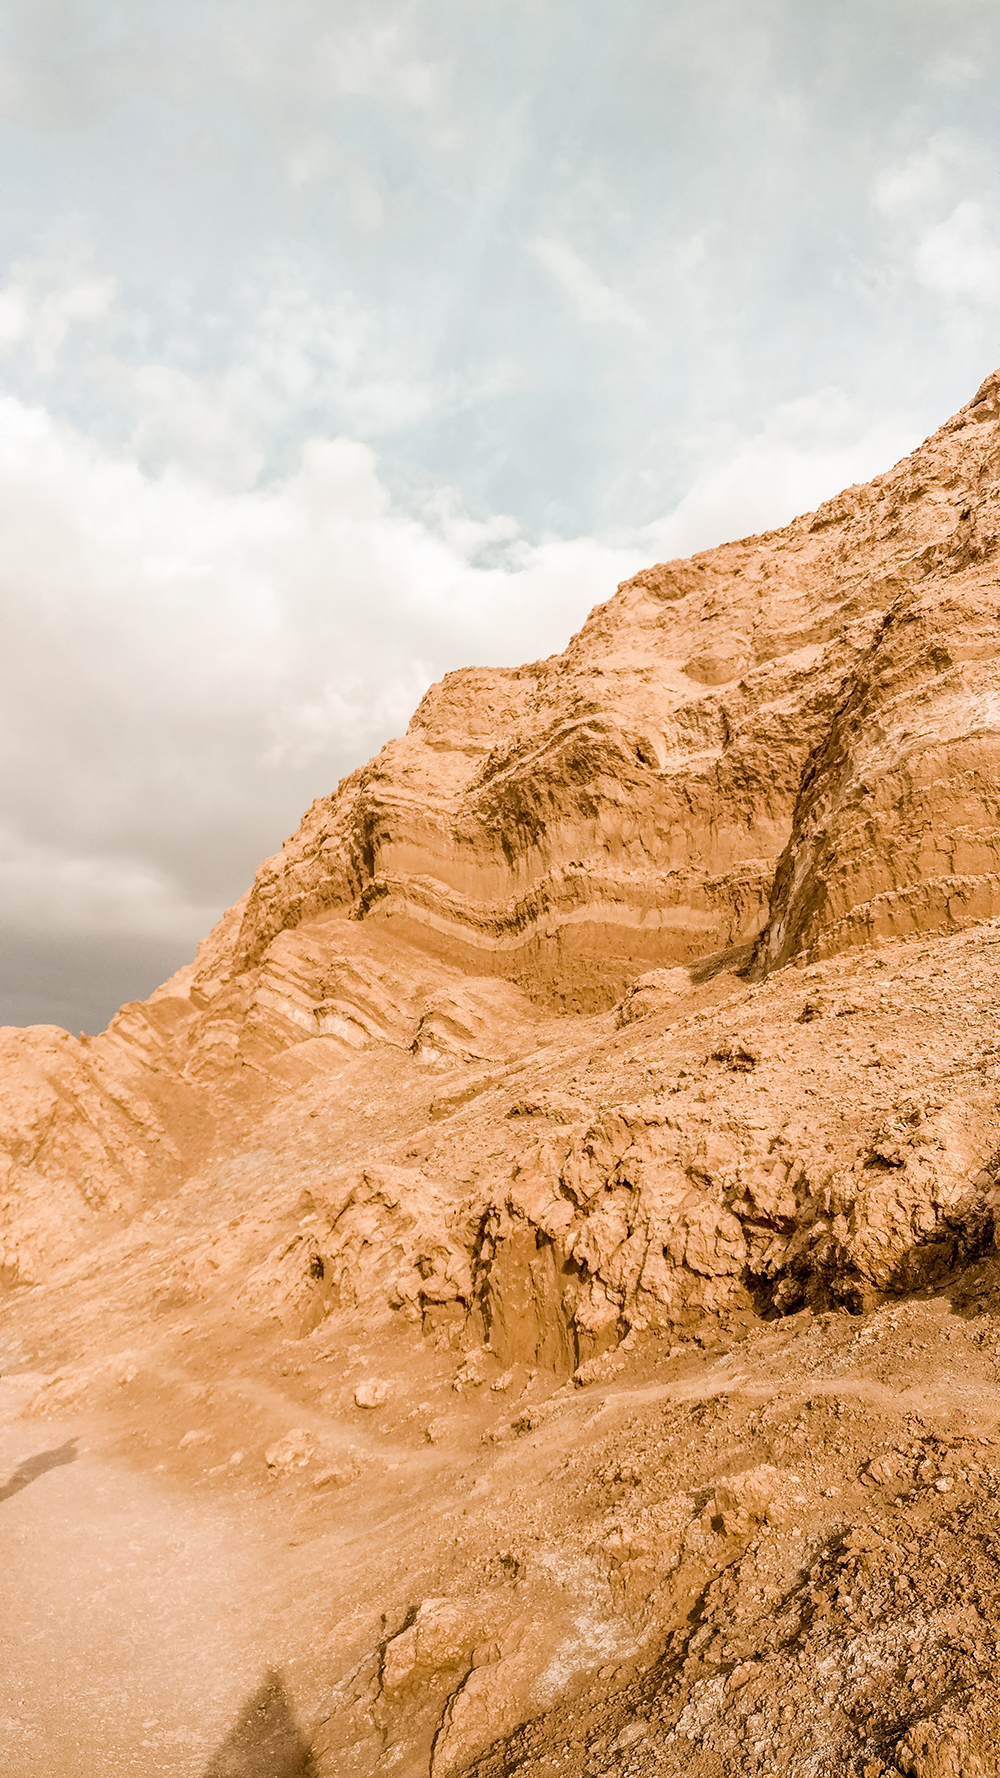 Valle de la Luna (Moon Valley) - How to plan your perfect trip to San Pedro de Atacama, Chile? | Aliz's Wonderland